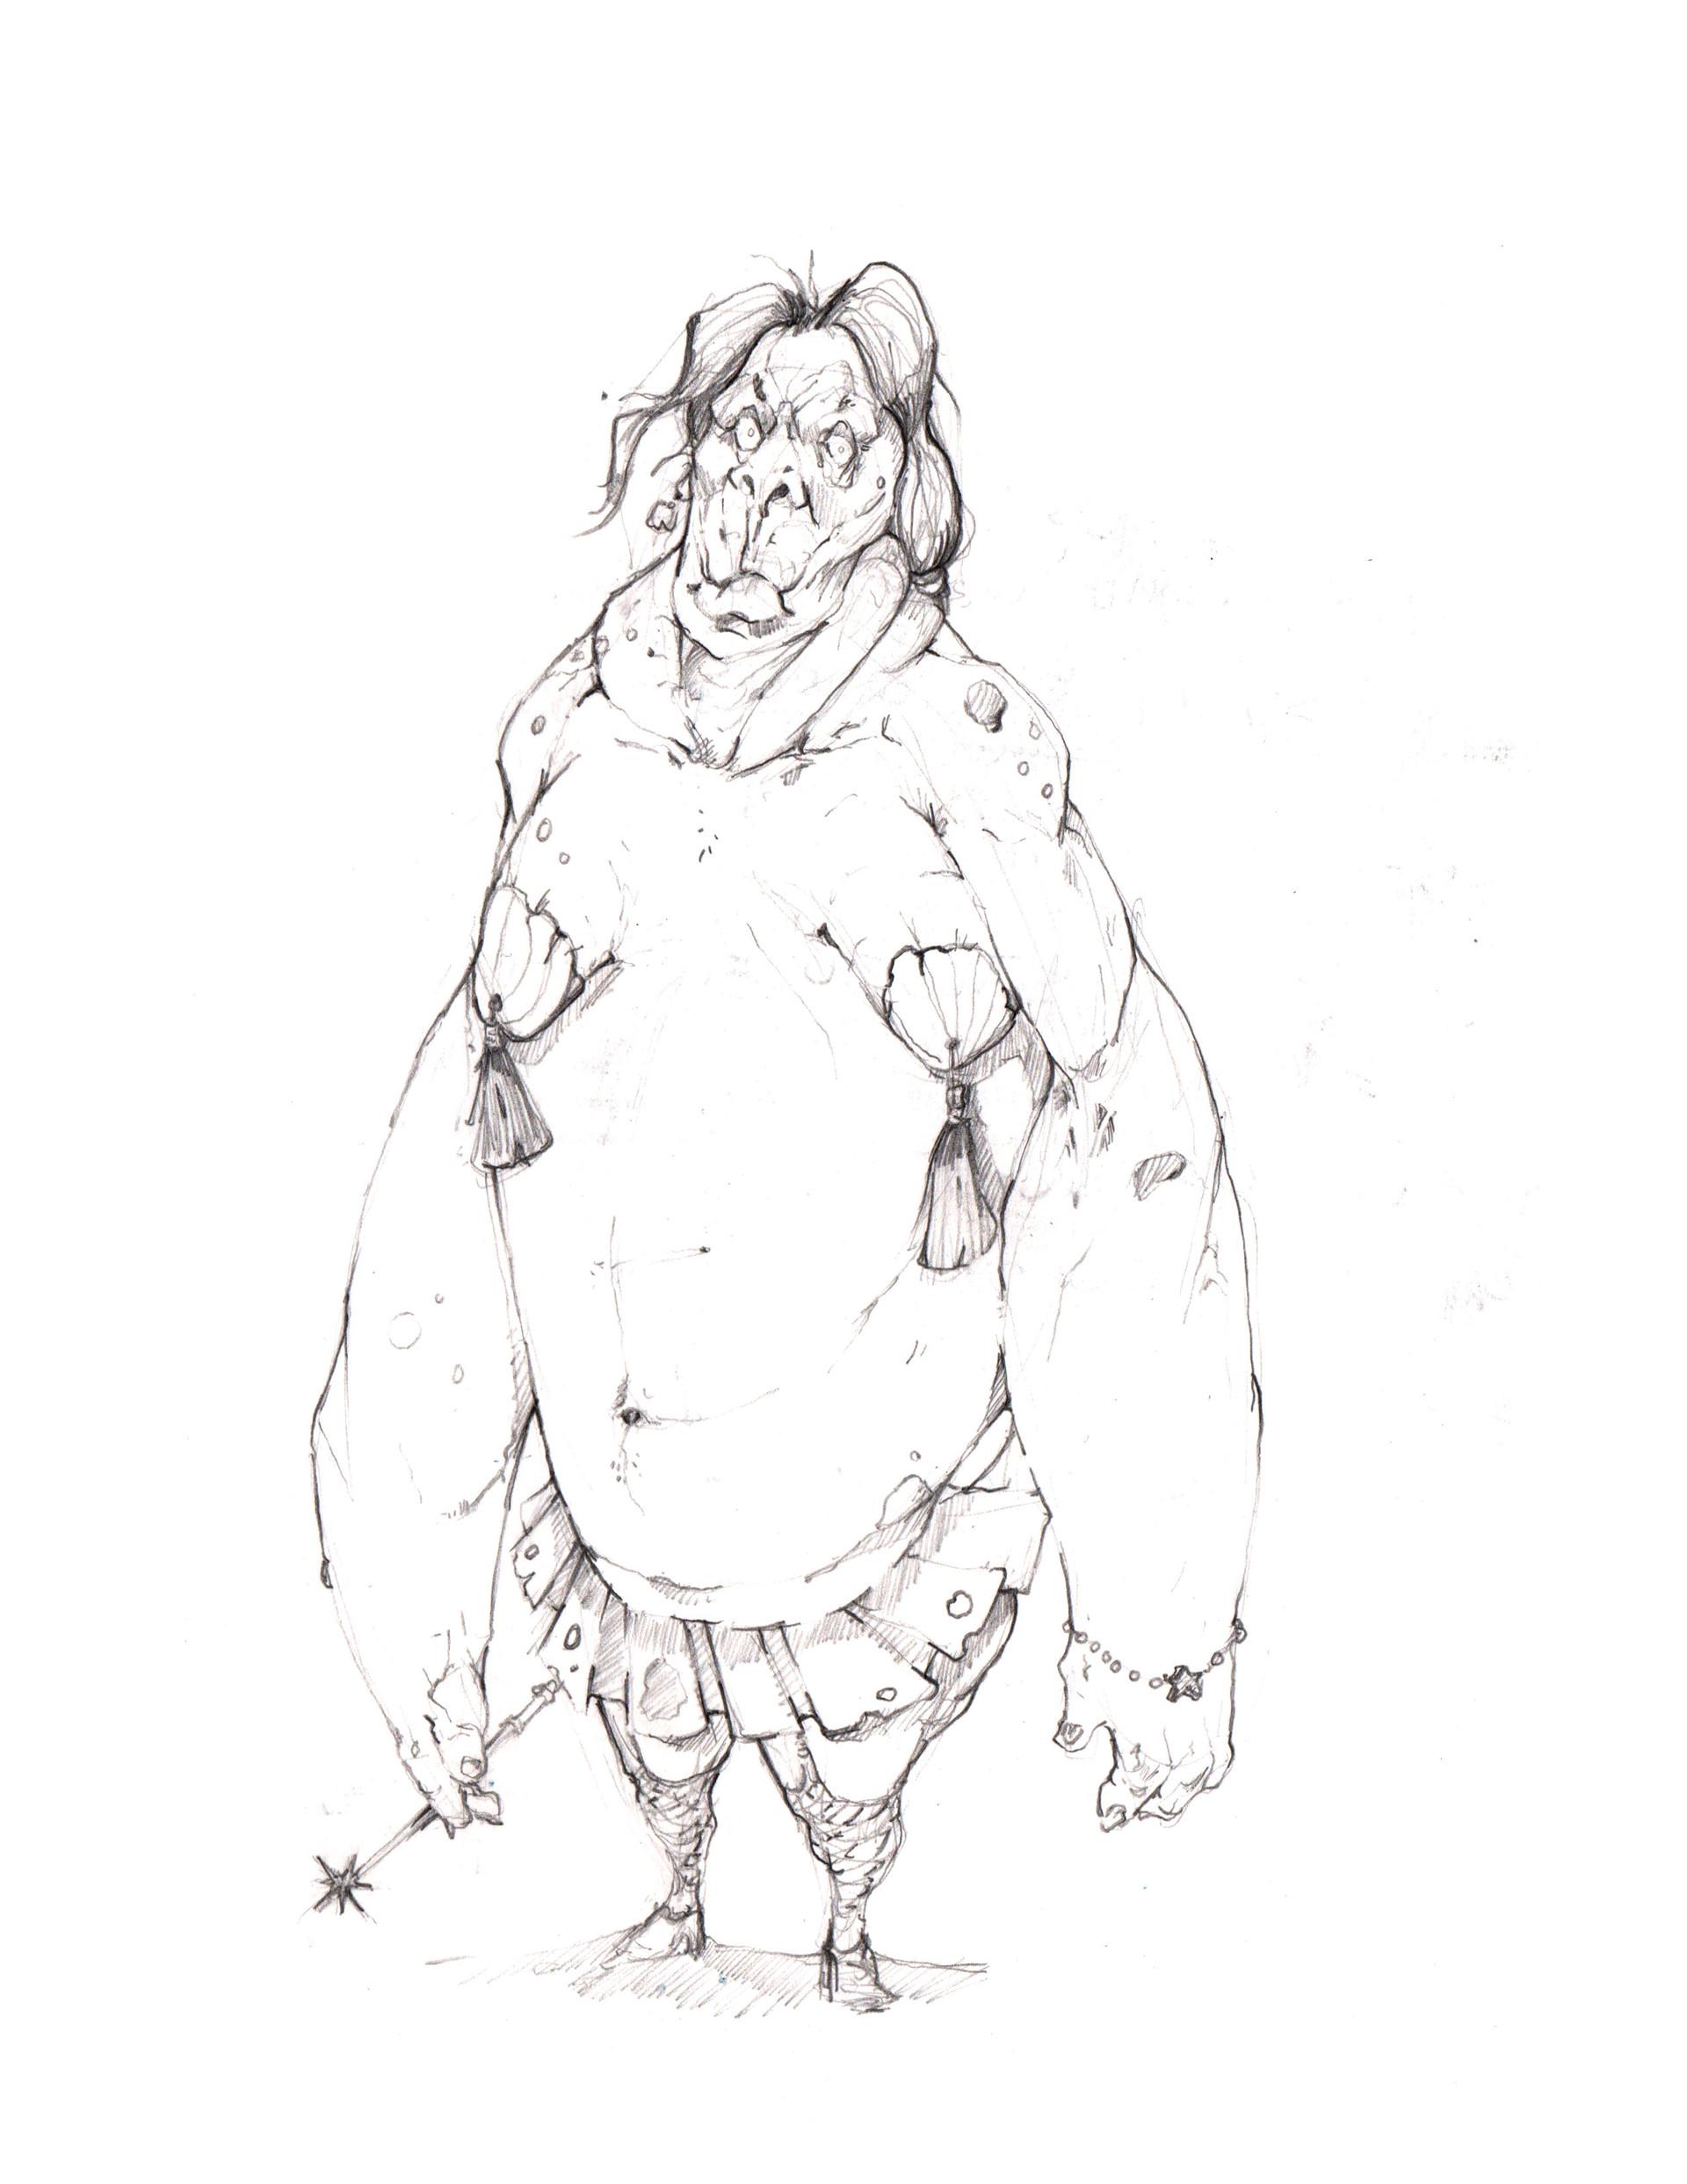 Brent poliquin 7 sketchesterm7 4